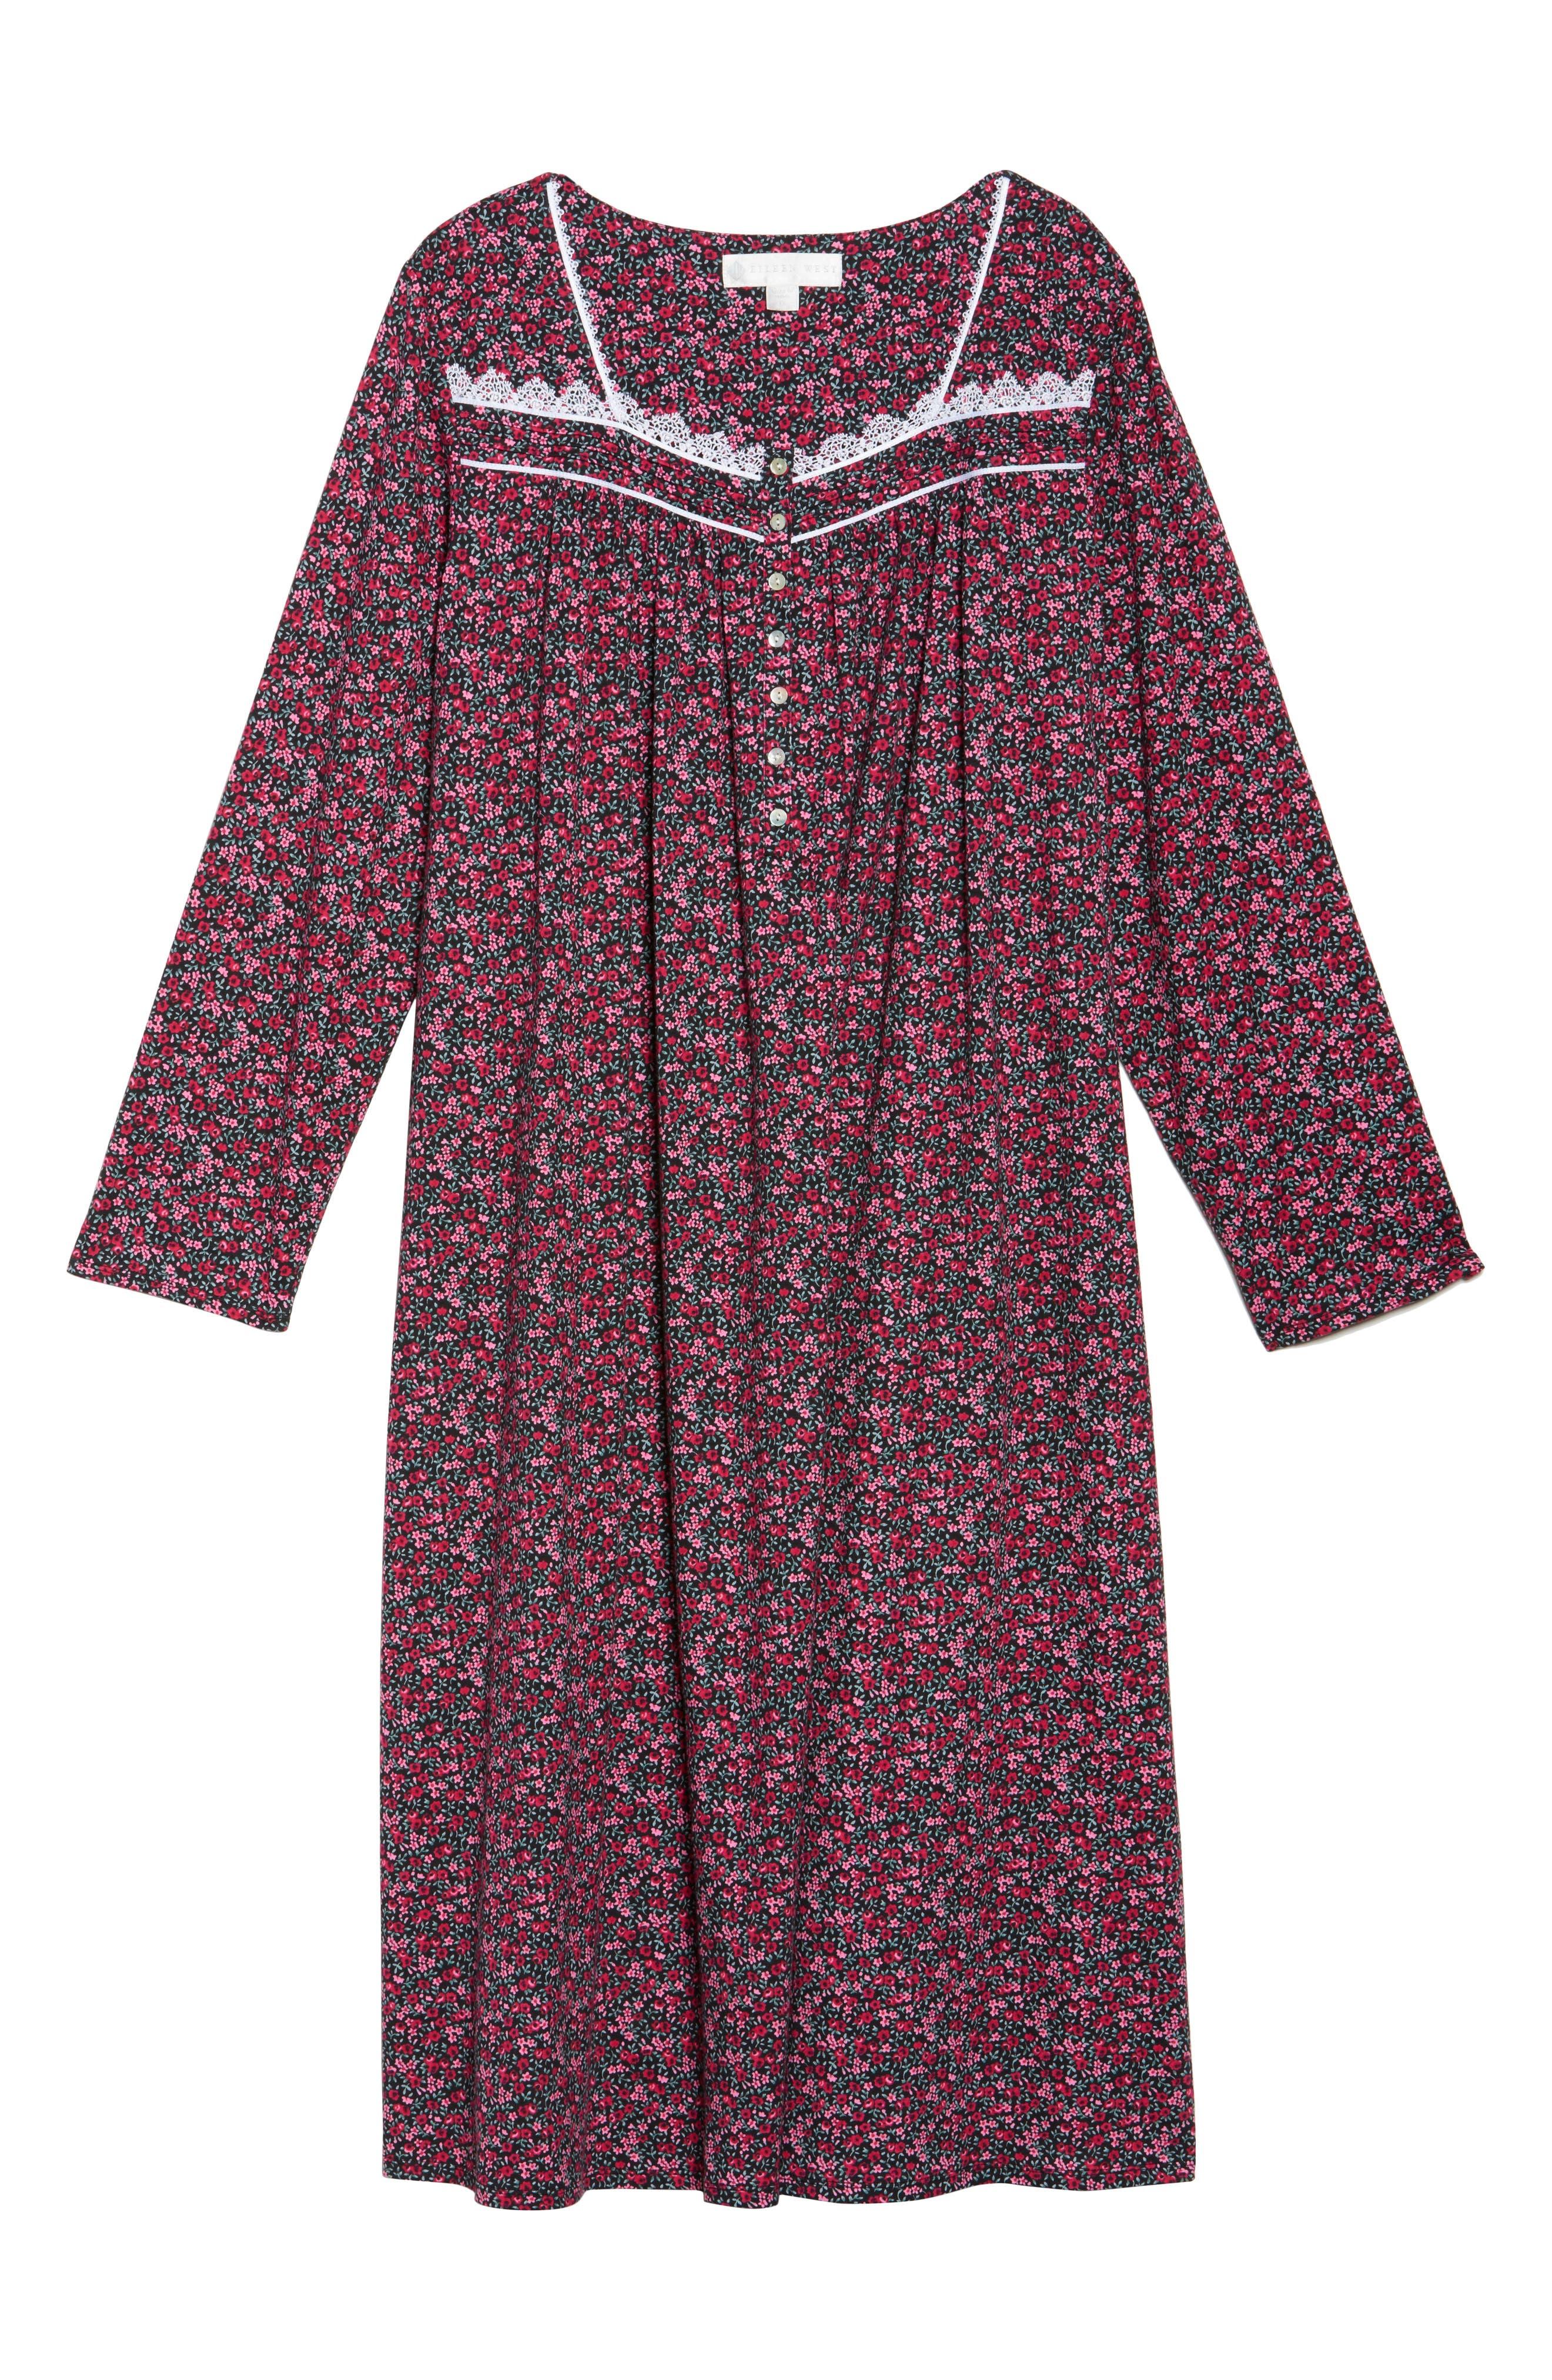 Short Nightgown,                             Alternate thumbnail 6, color,                             559